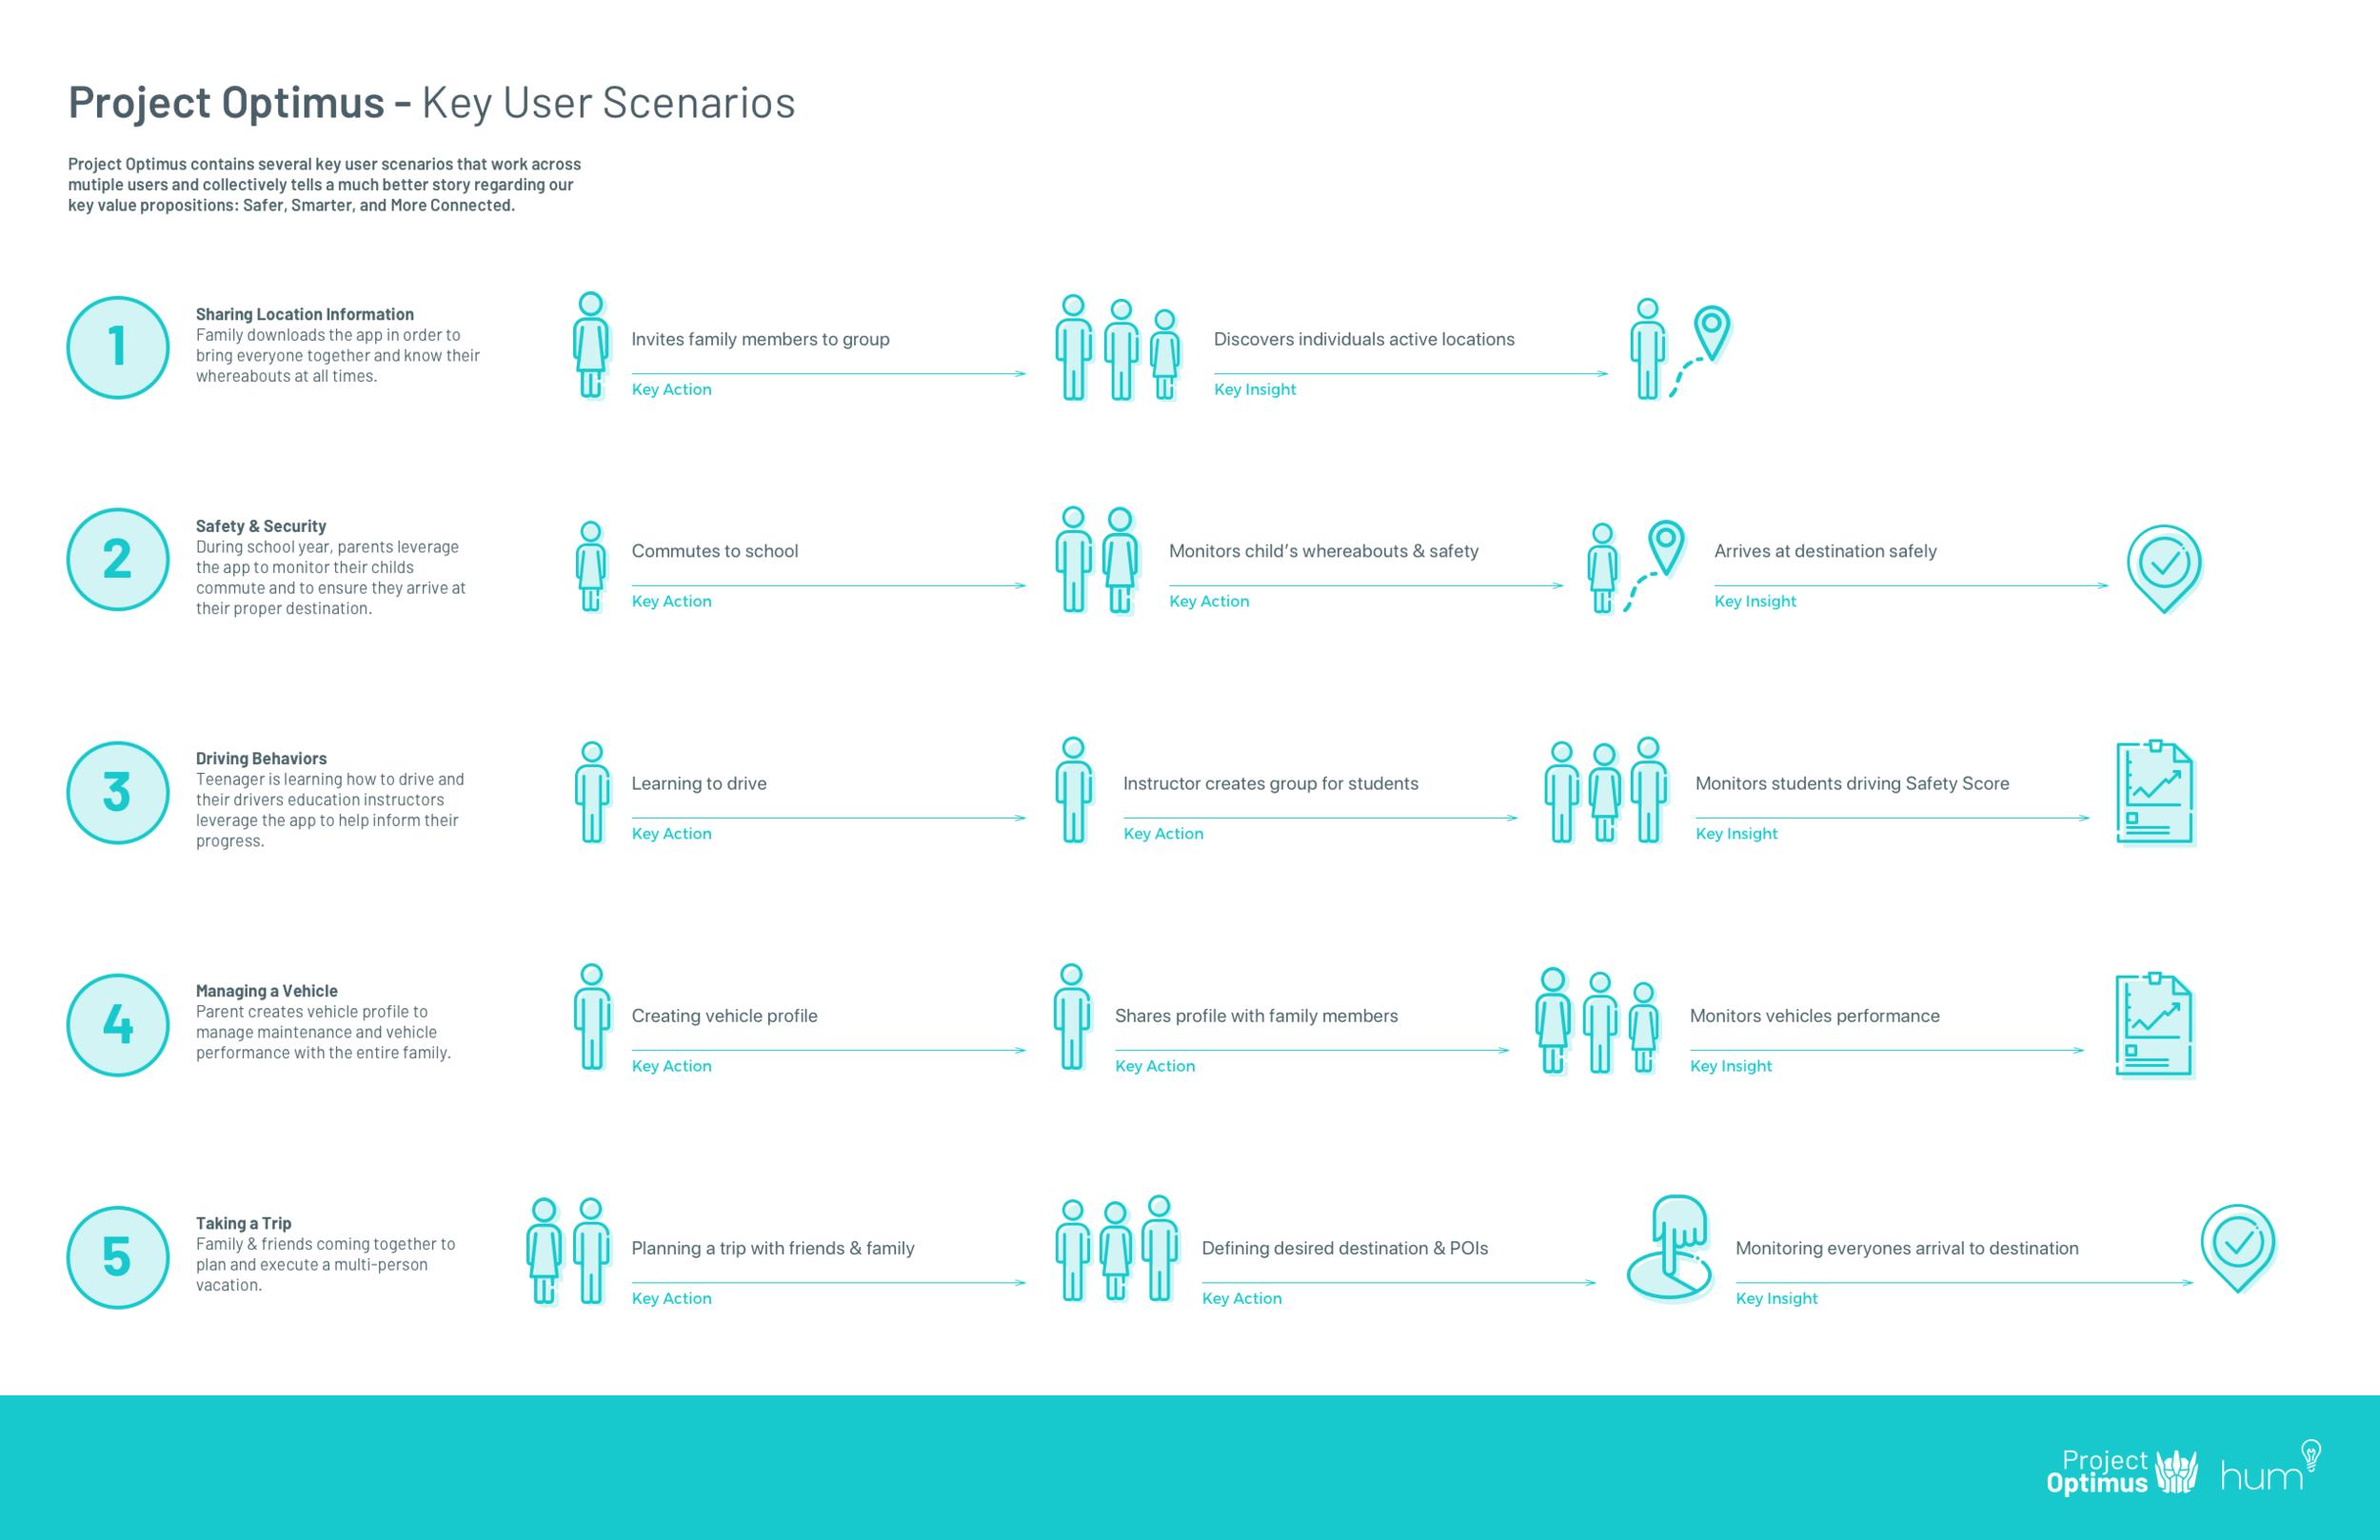 Key user scenarios to help prioritization and key focus areas.